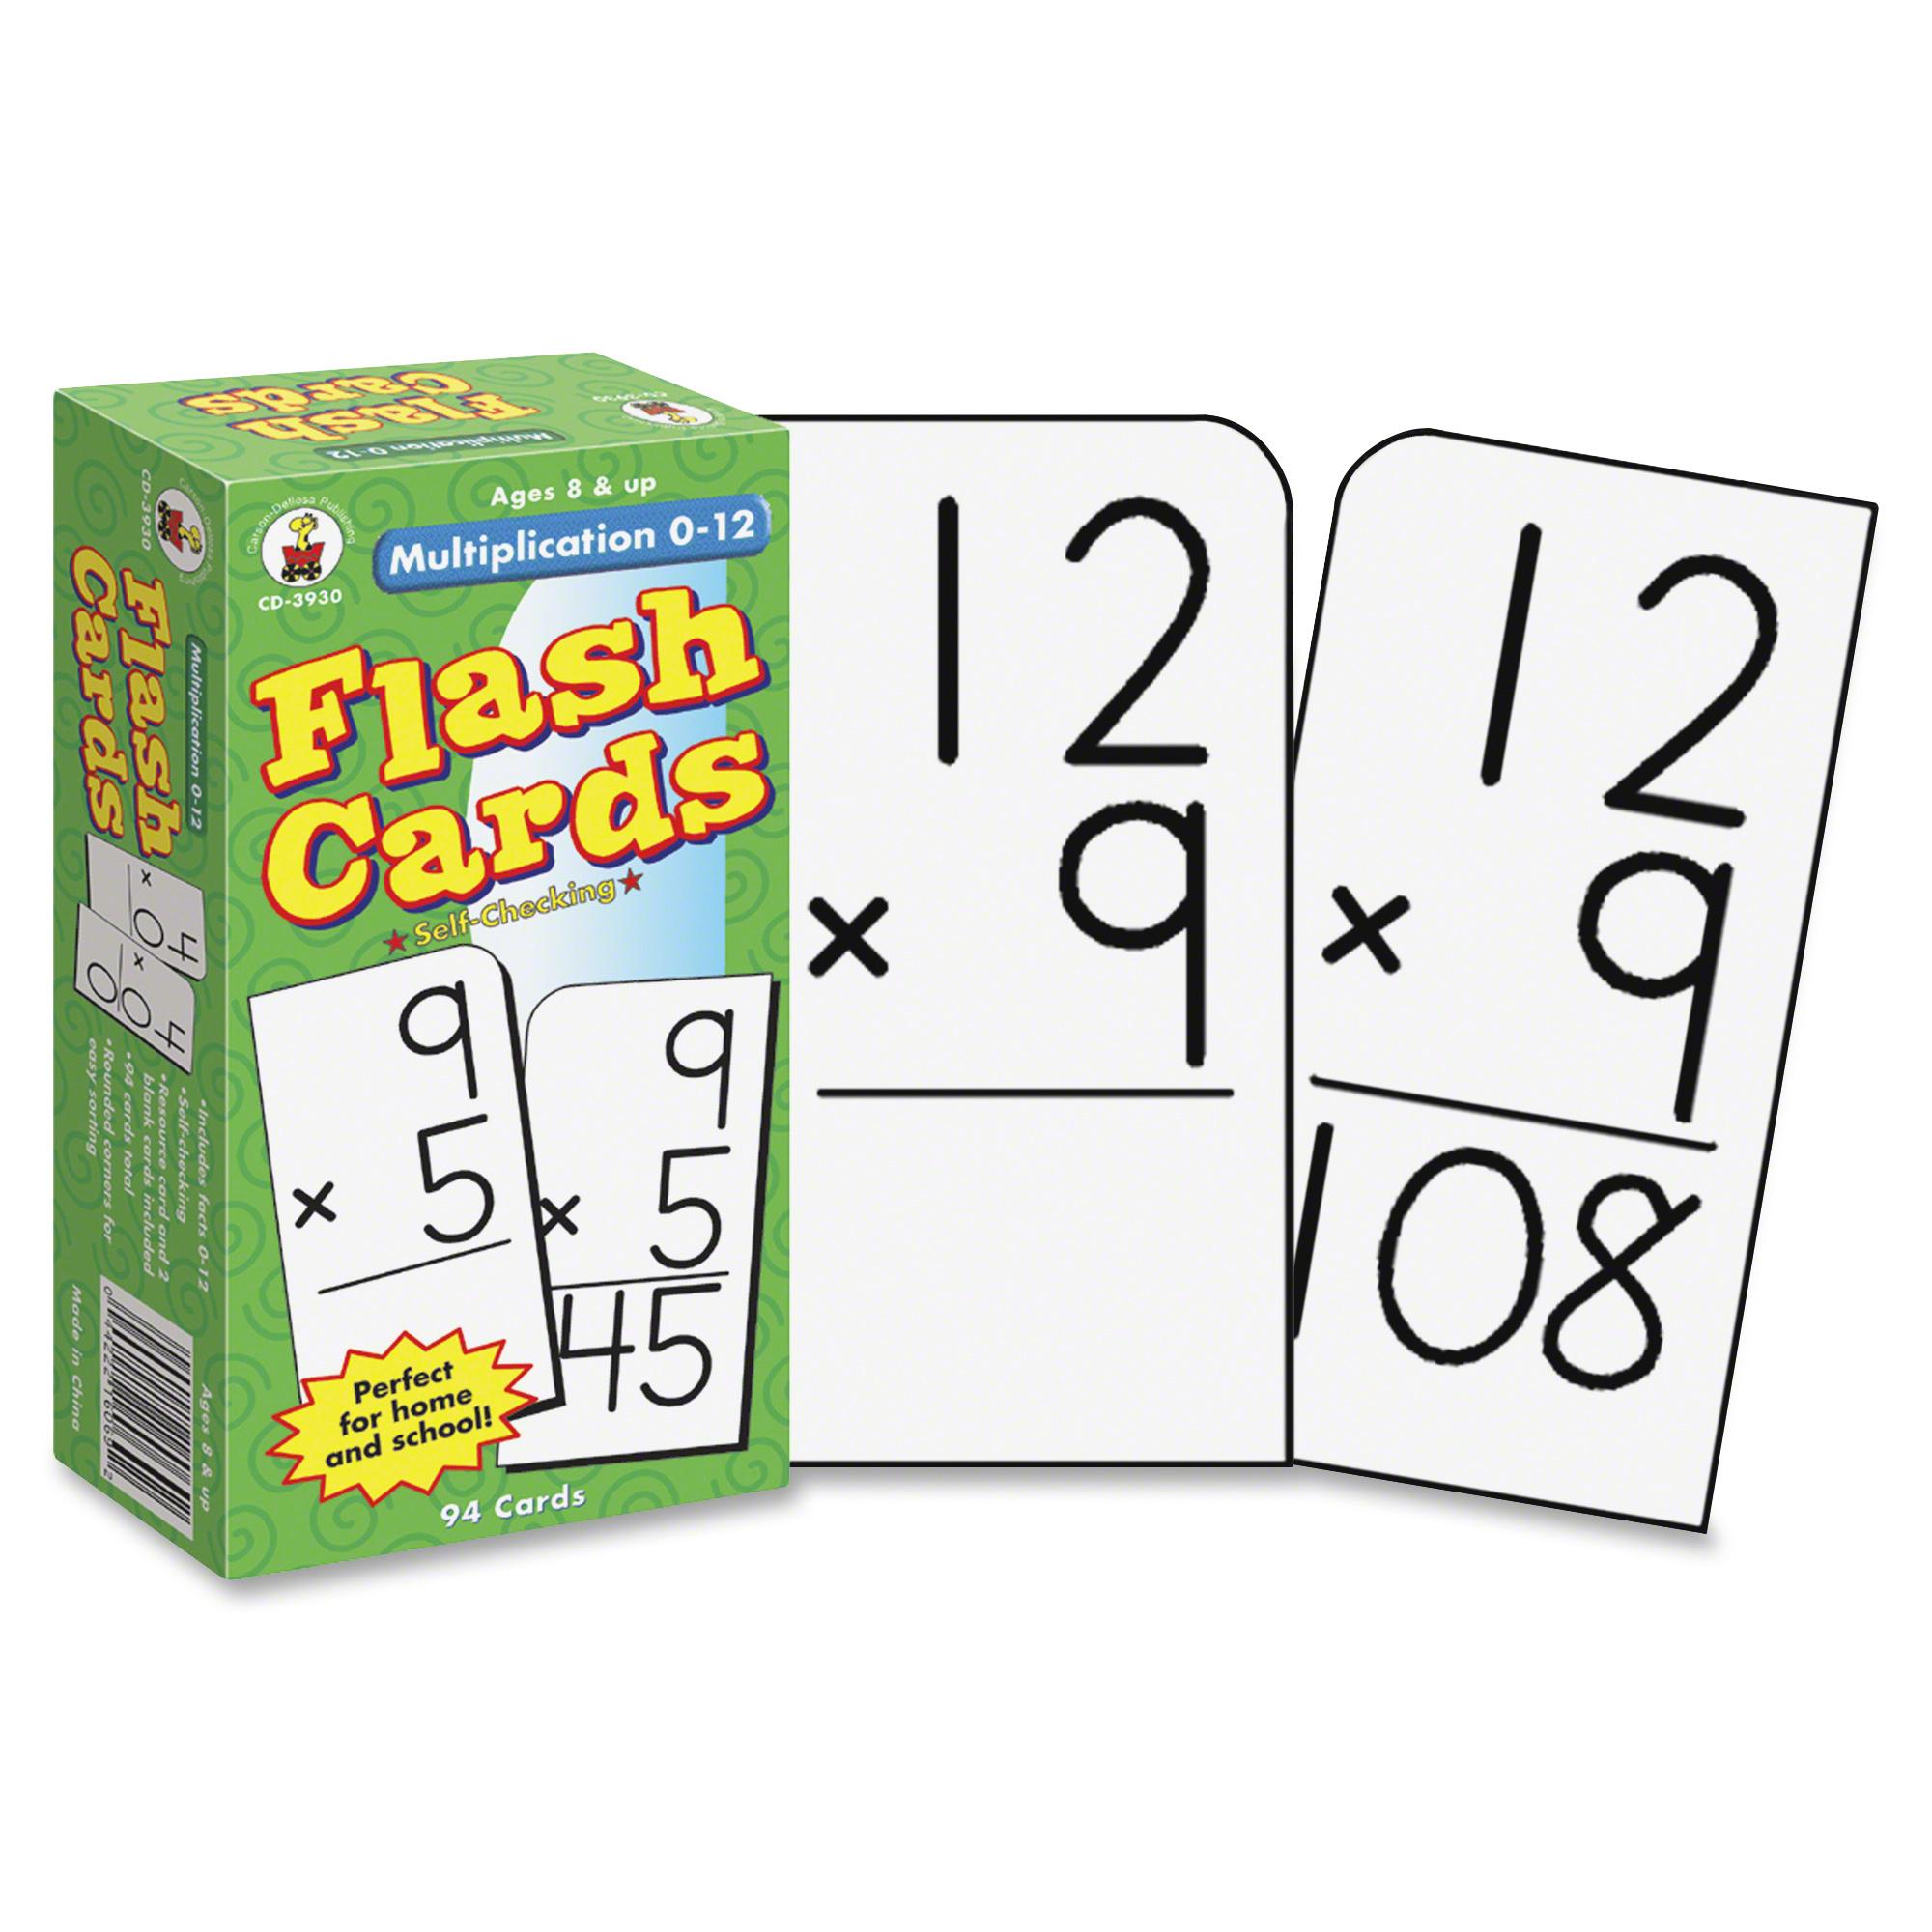 Carson Dellosa Education Grades 3-5 Multiplication 0-12 Flash Cards - Math